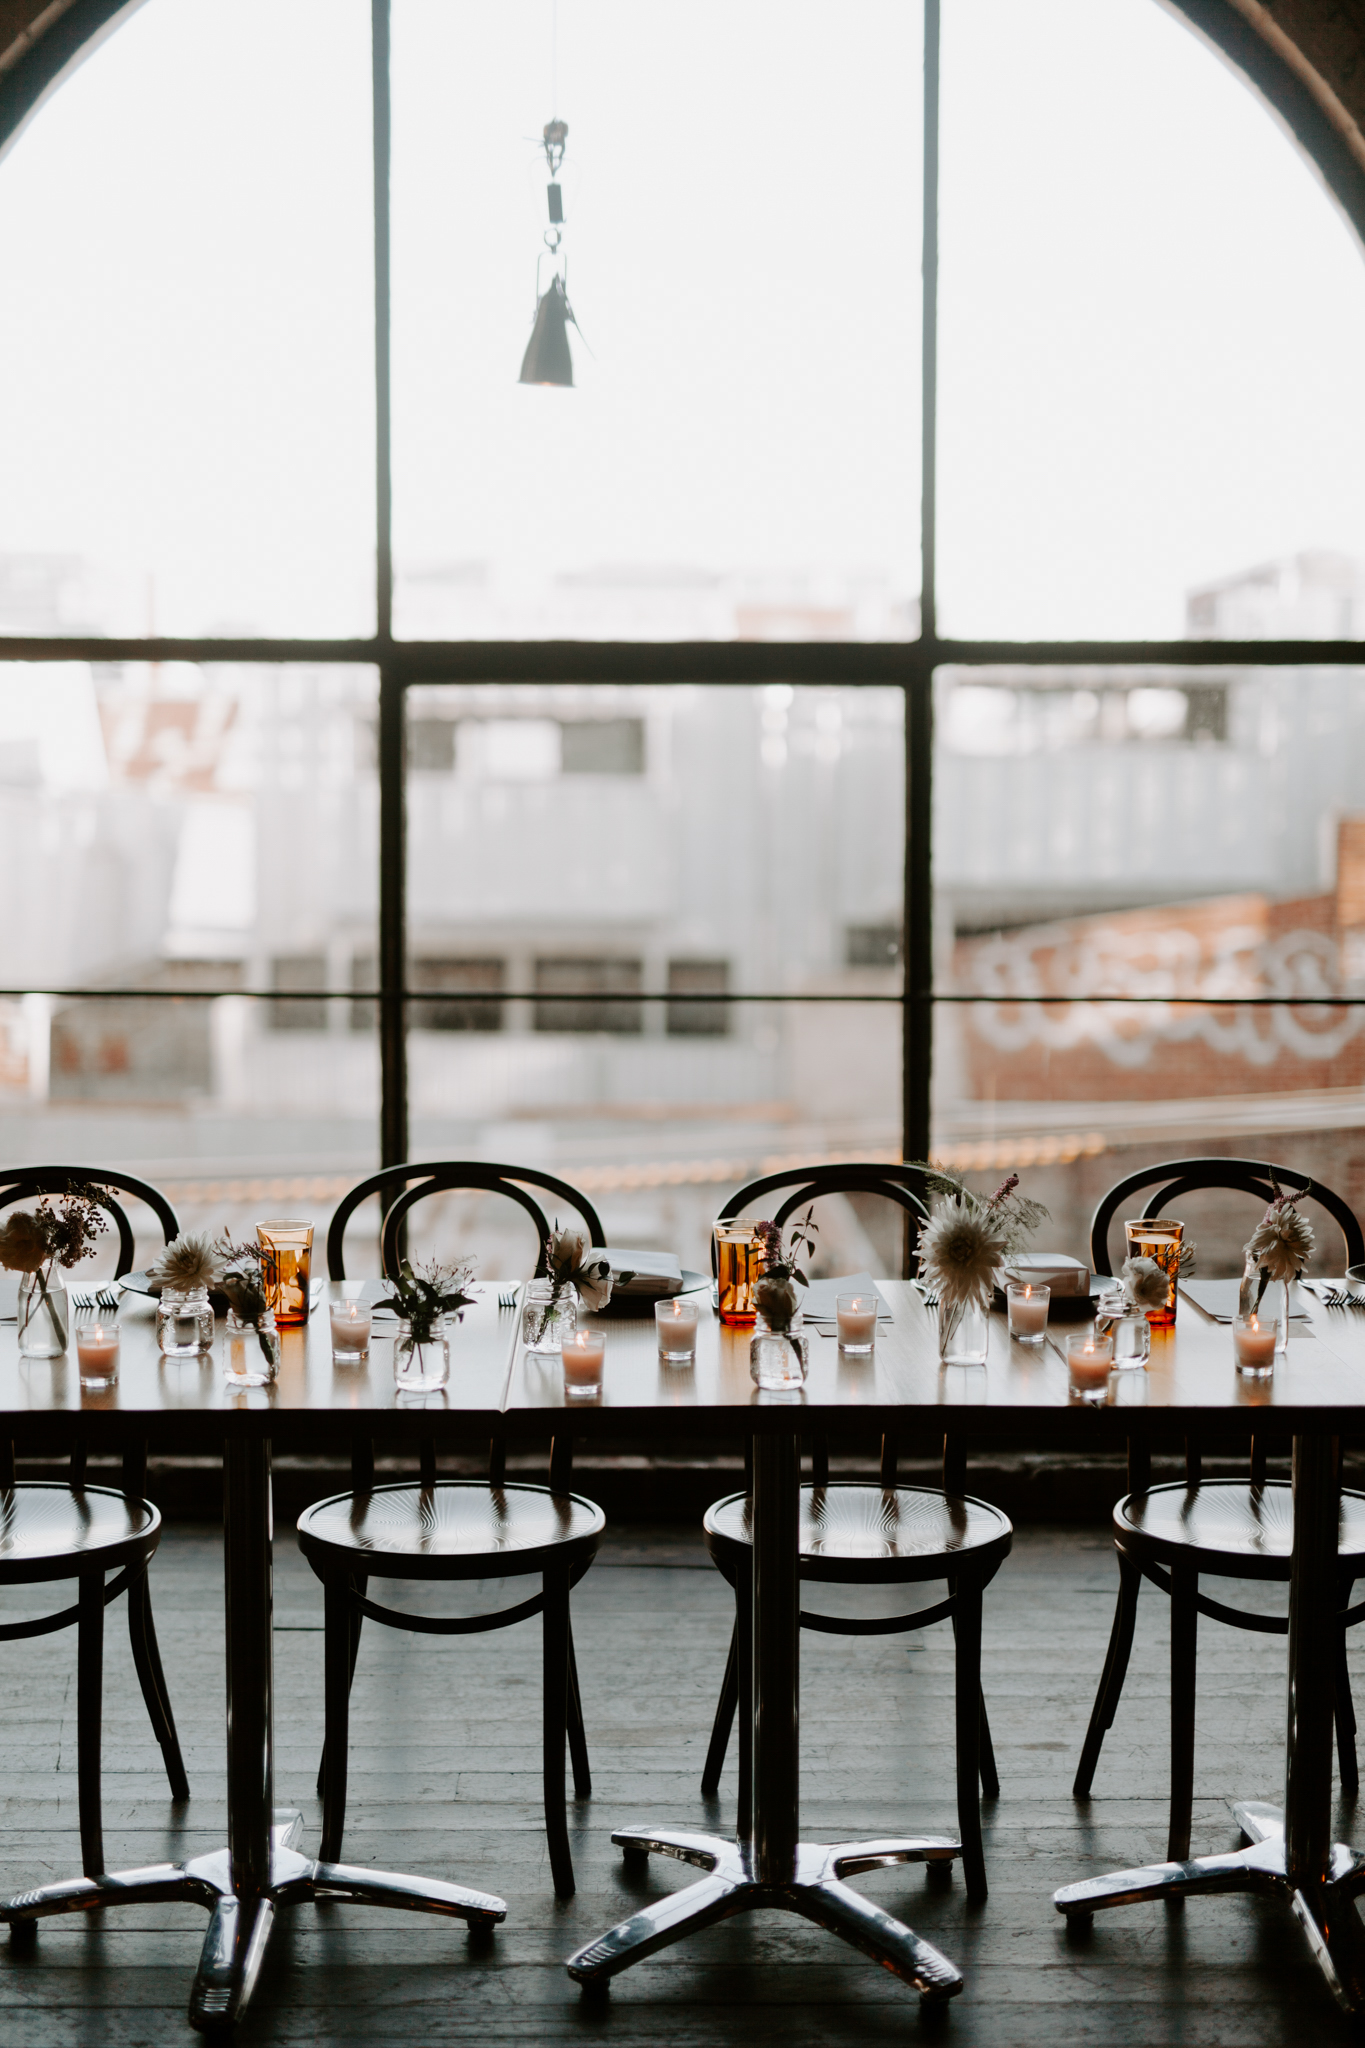 Panama-Dining-Room-wedding-emotionsandmath-039.jpg